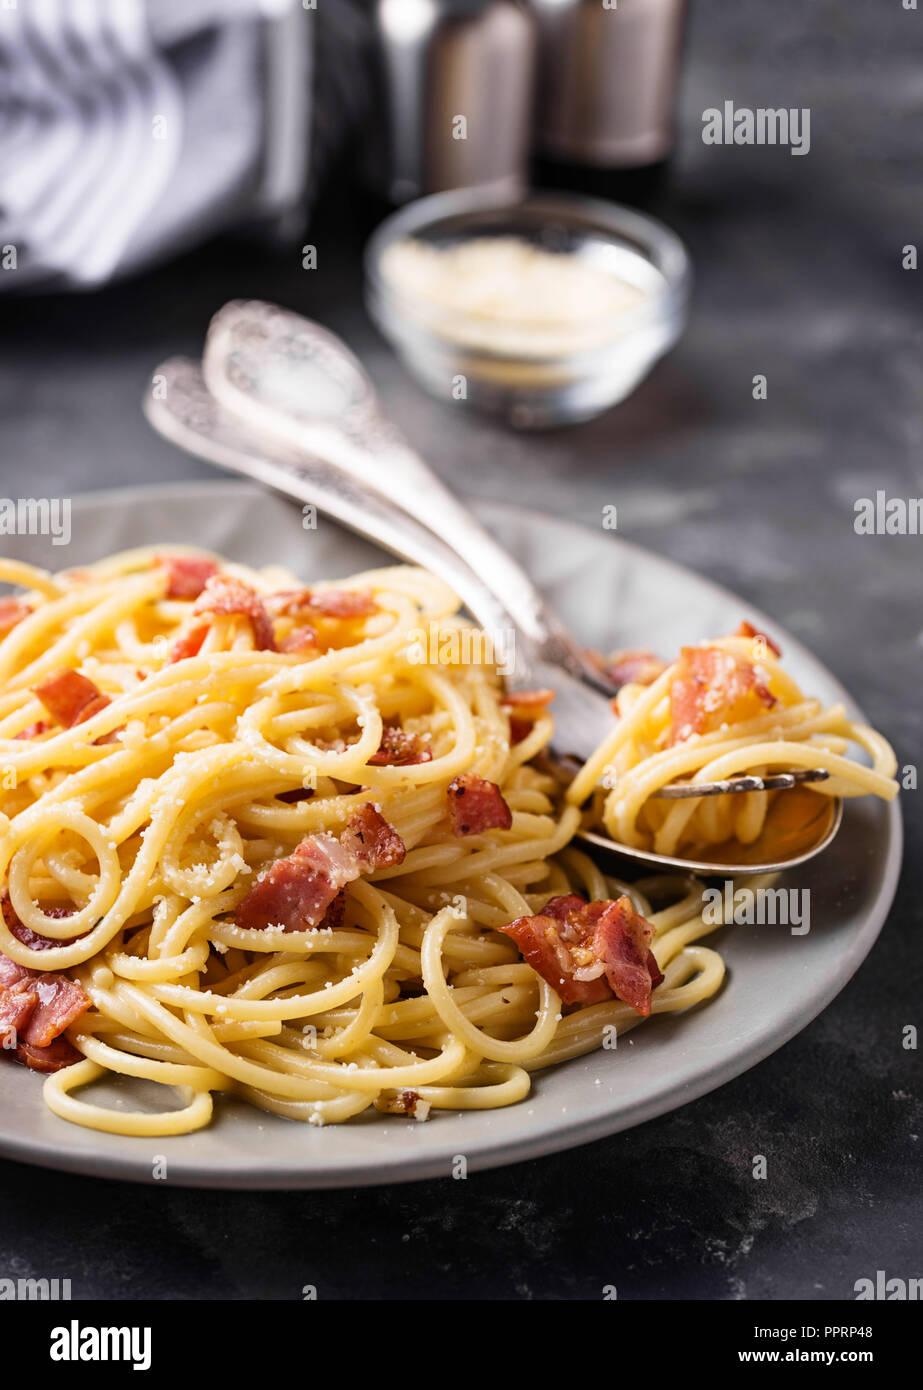 Pasta Carbonara with bacon and parmesan - Stock Image